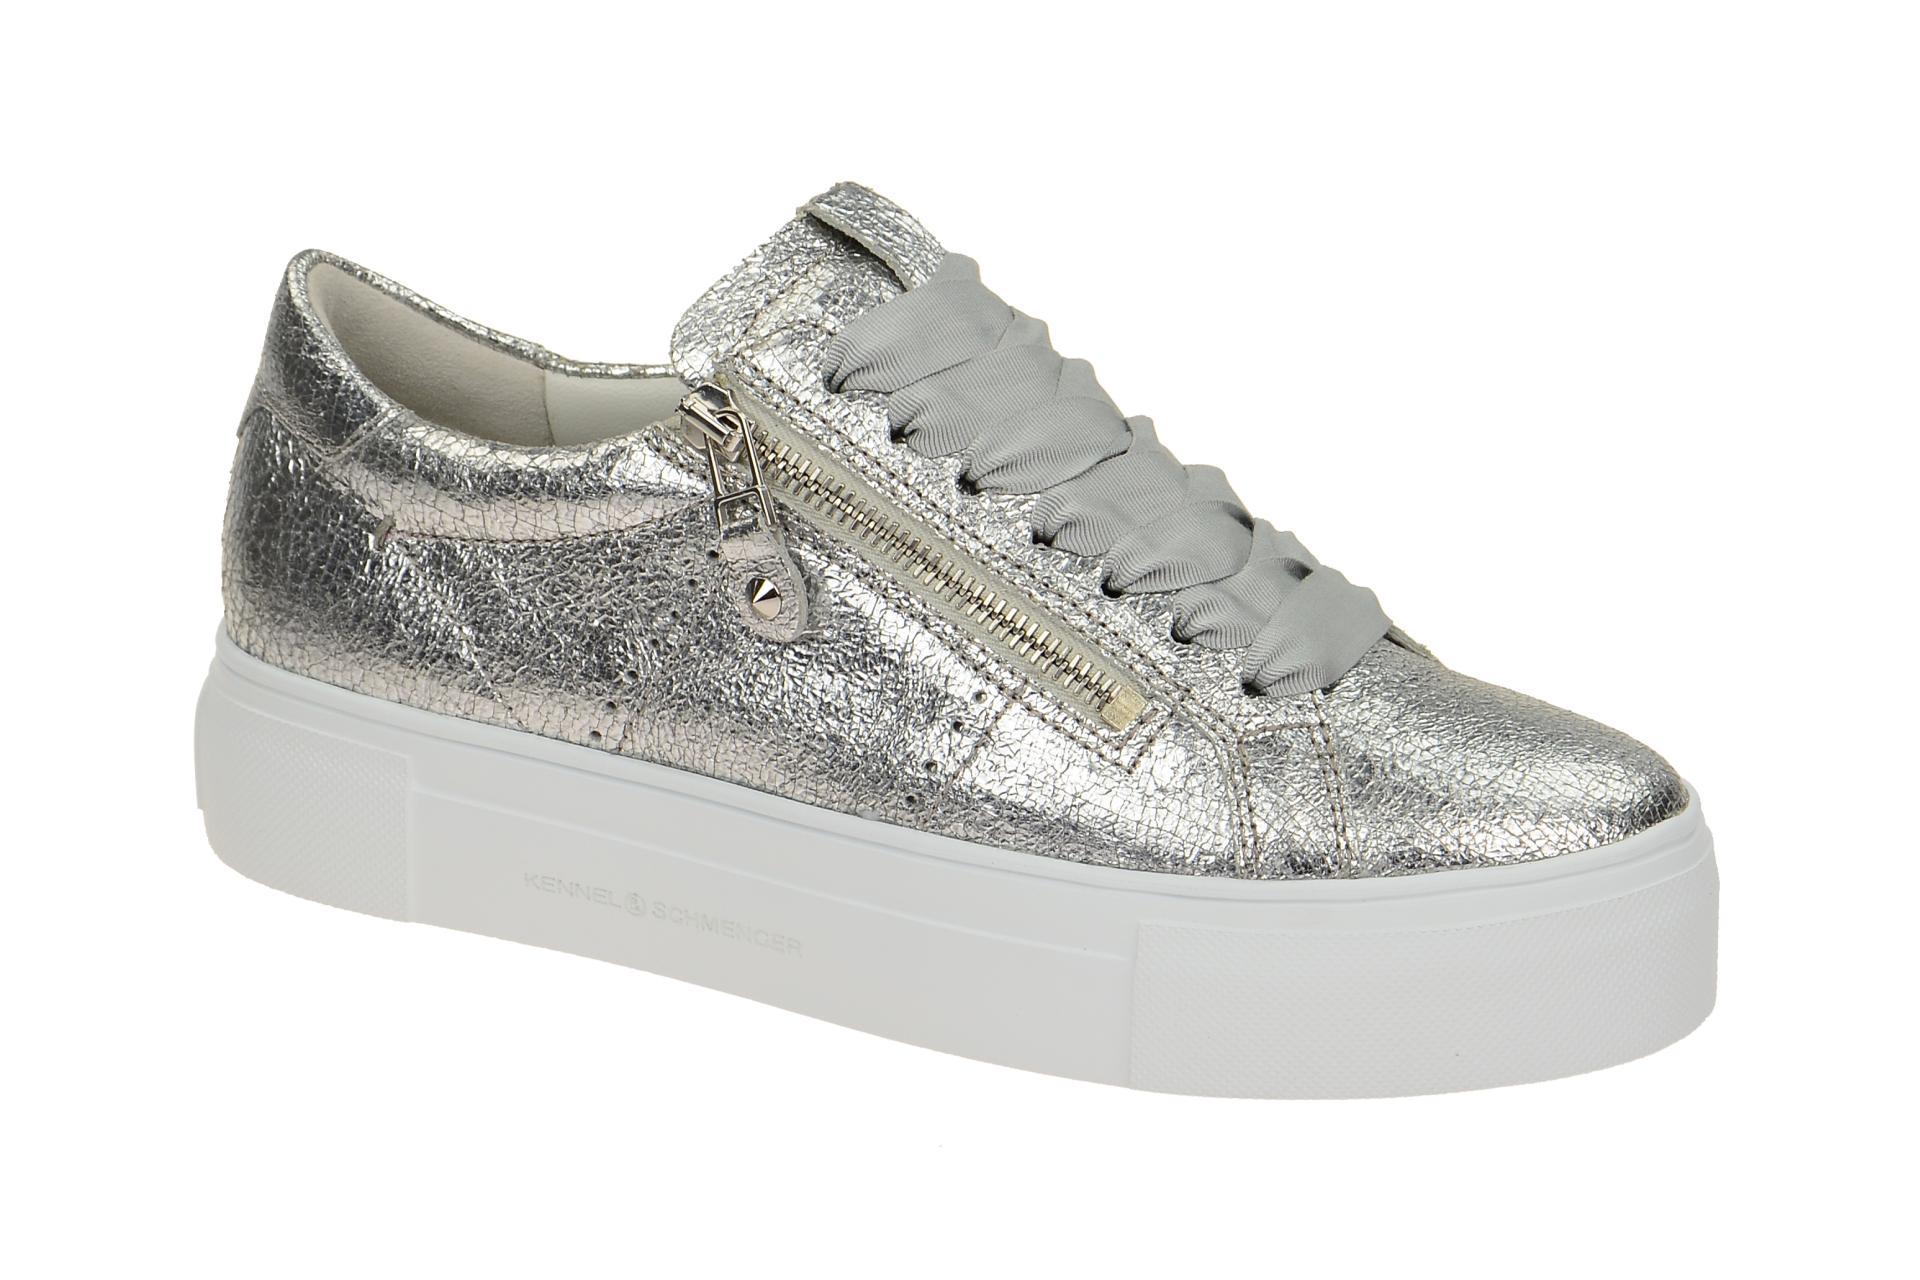 a70766db8a0d84 K+S Big Plateau Sneaker silber metallic - Schuhhaus Strauch Shop